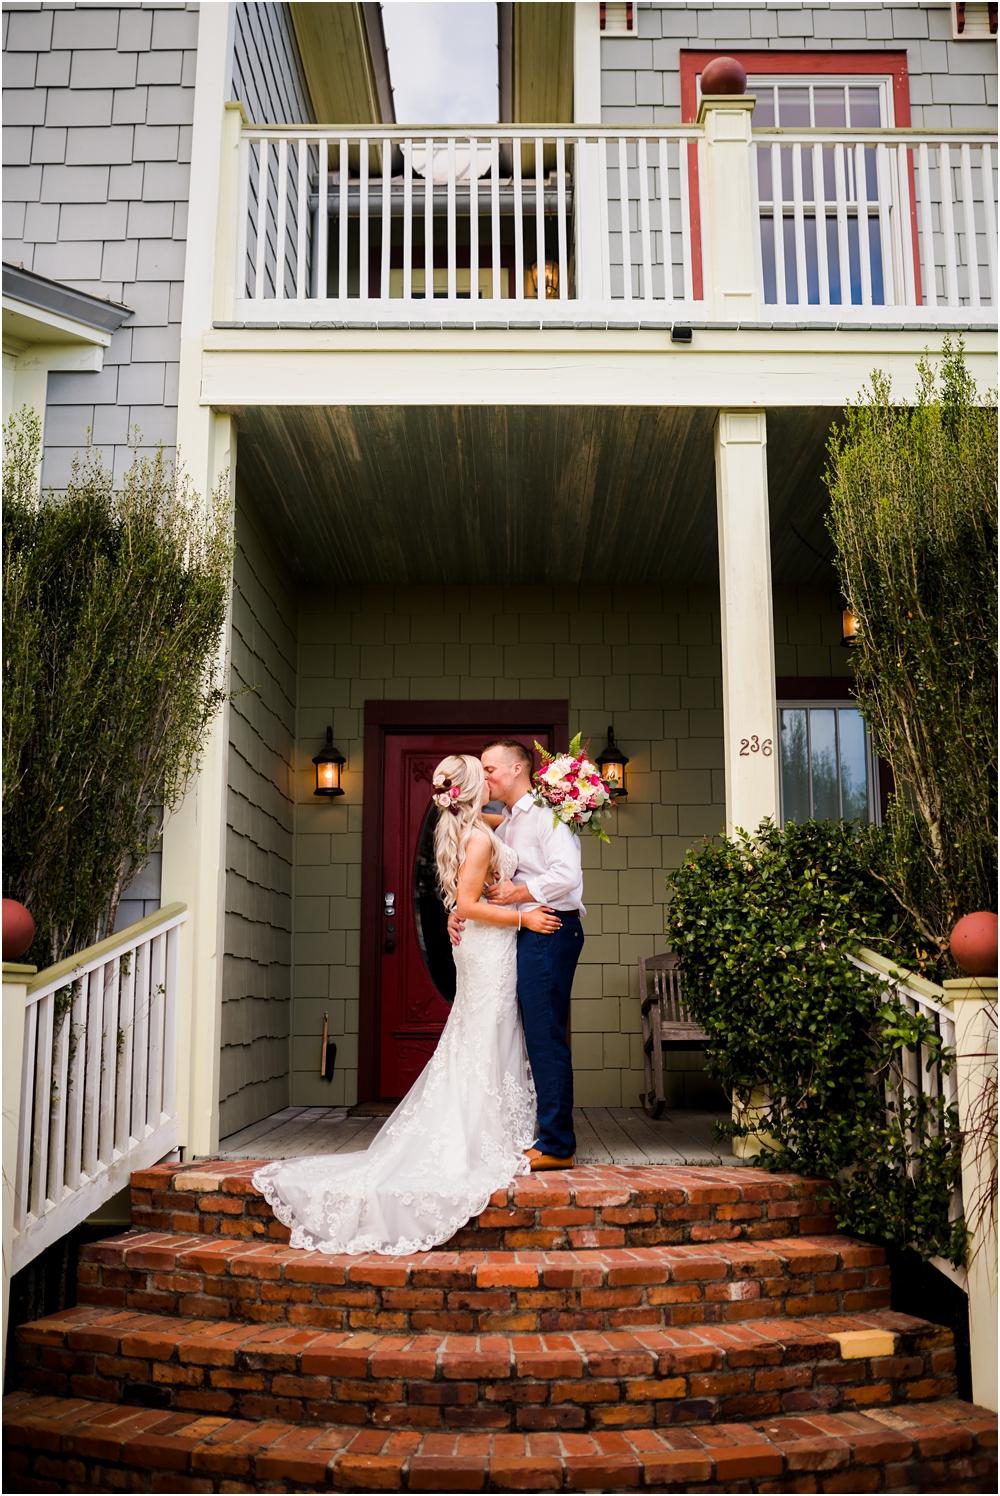 mcglothlin-wedding-kiersten-stevenson-photography-30a-panama-city-beach-dothan-tallahassee-(55-of-145).jpg